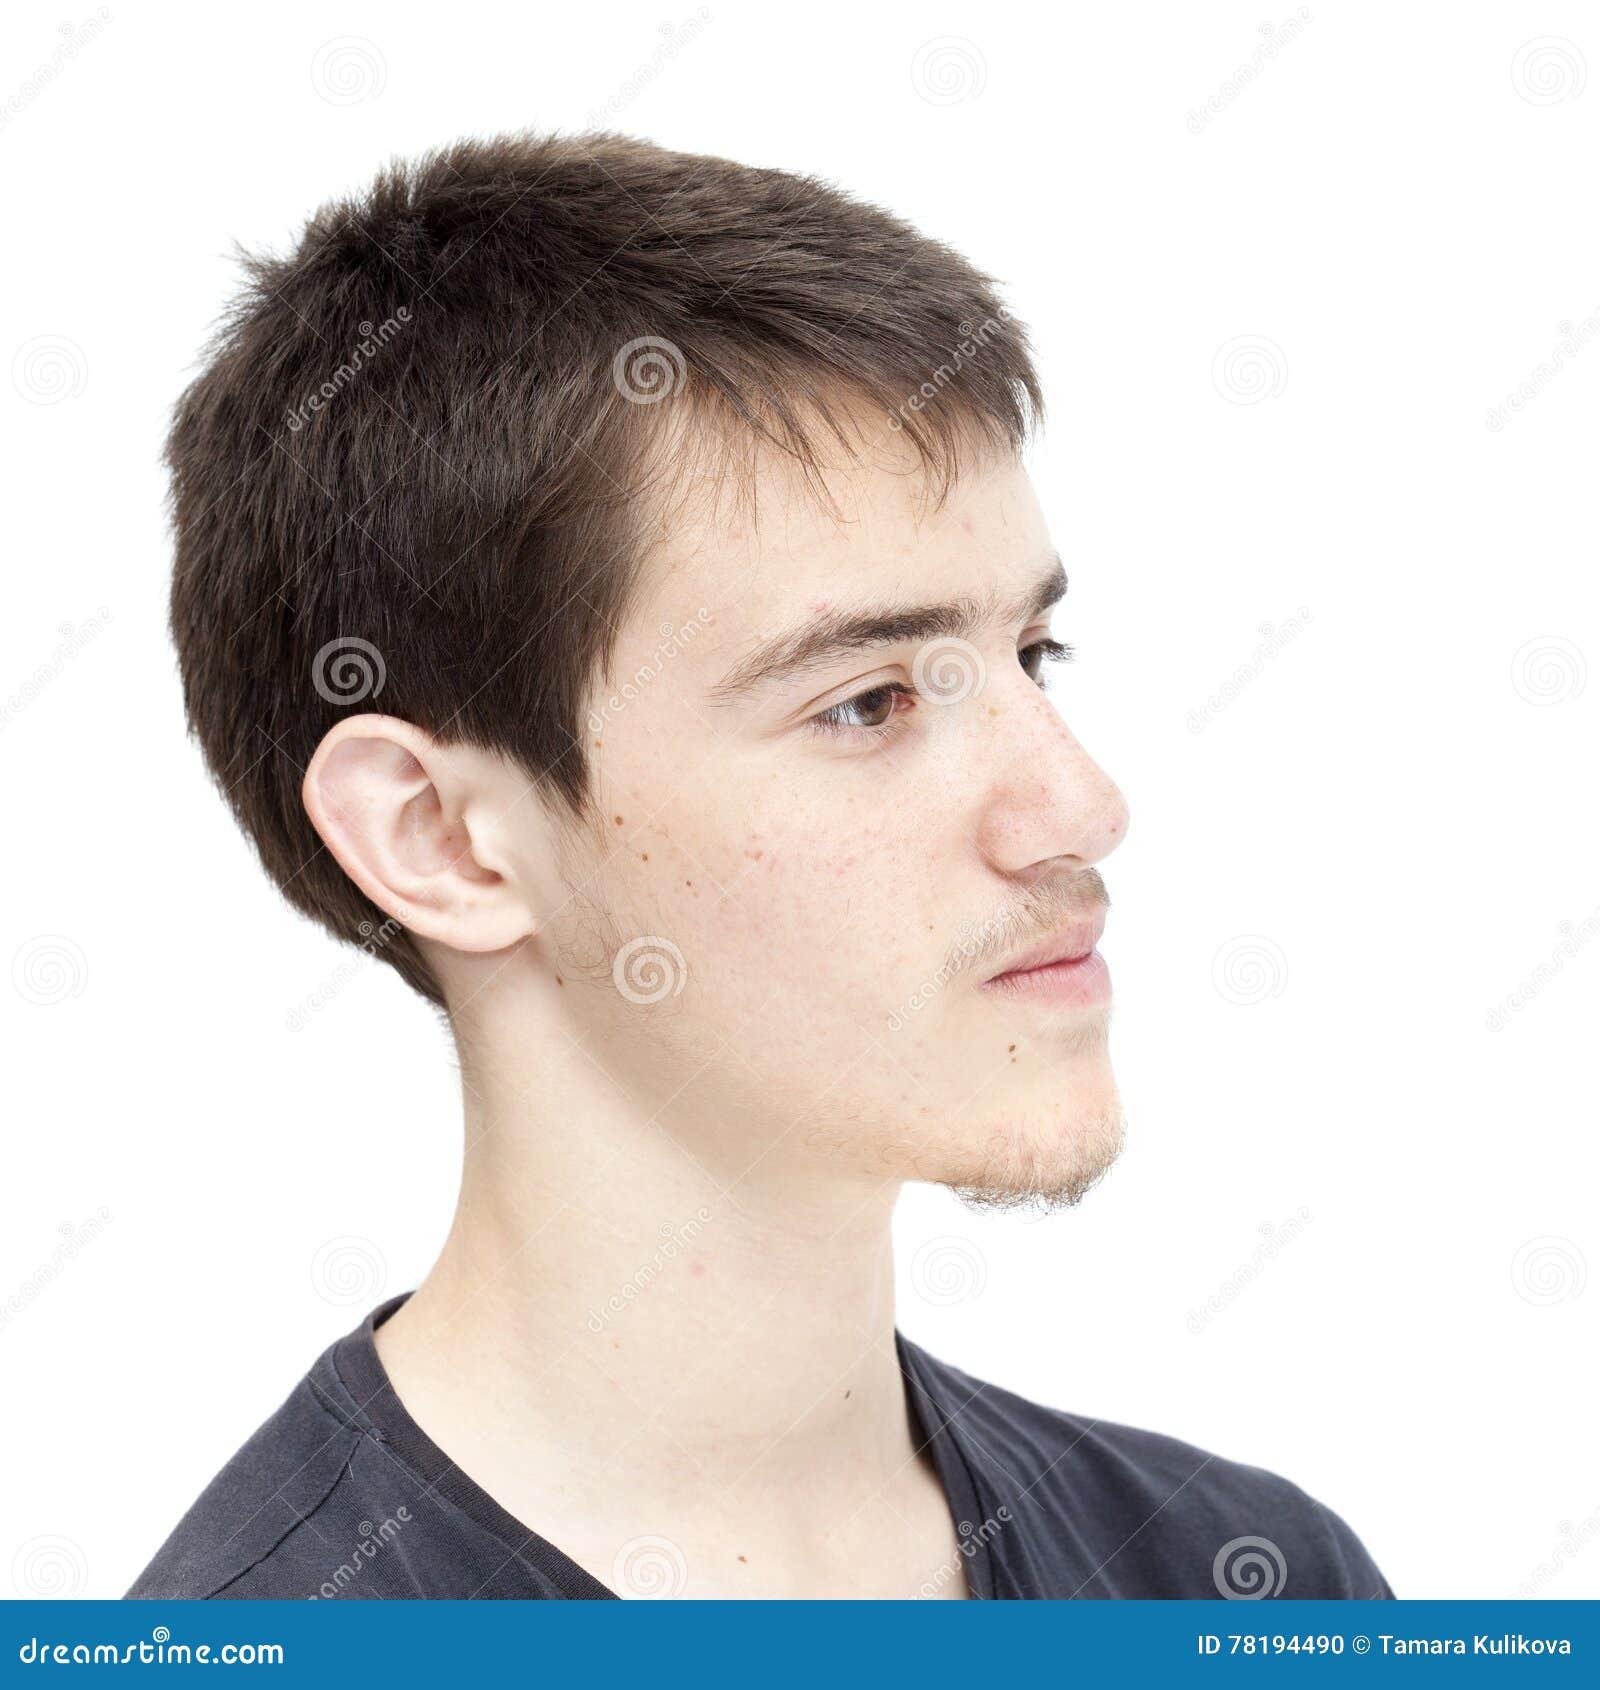 Teenage Boy With Short Dark Hair Stock Photo   Image of dark ...